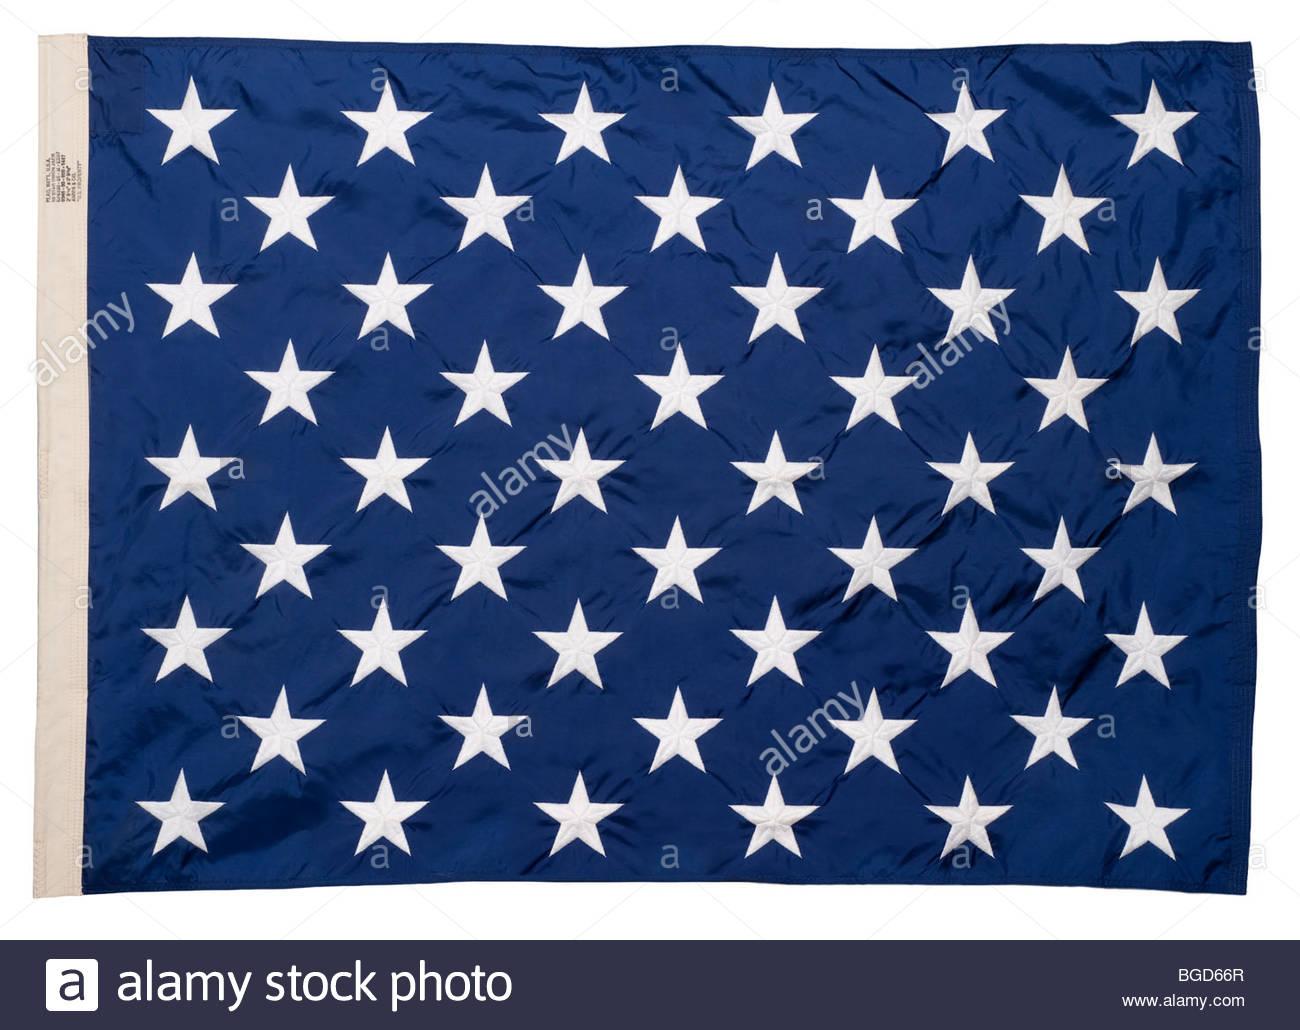 50 Star Union Jack Flag US Navy Genuine US Navy 50 star union jack flag - Stock Image